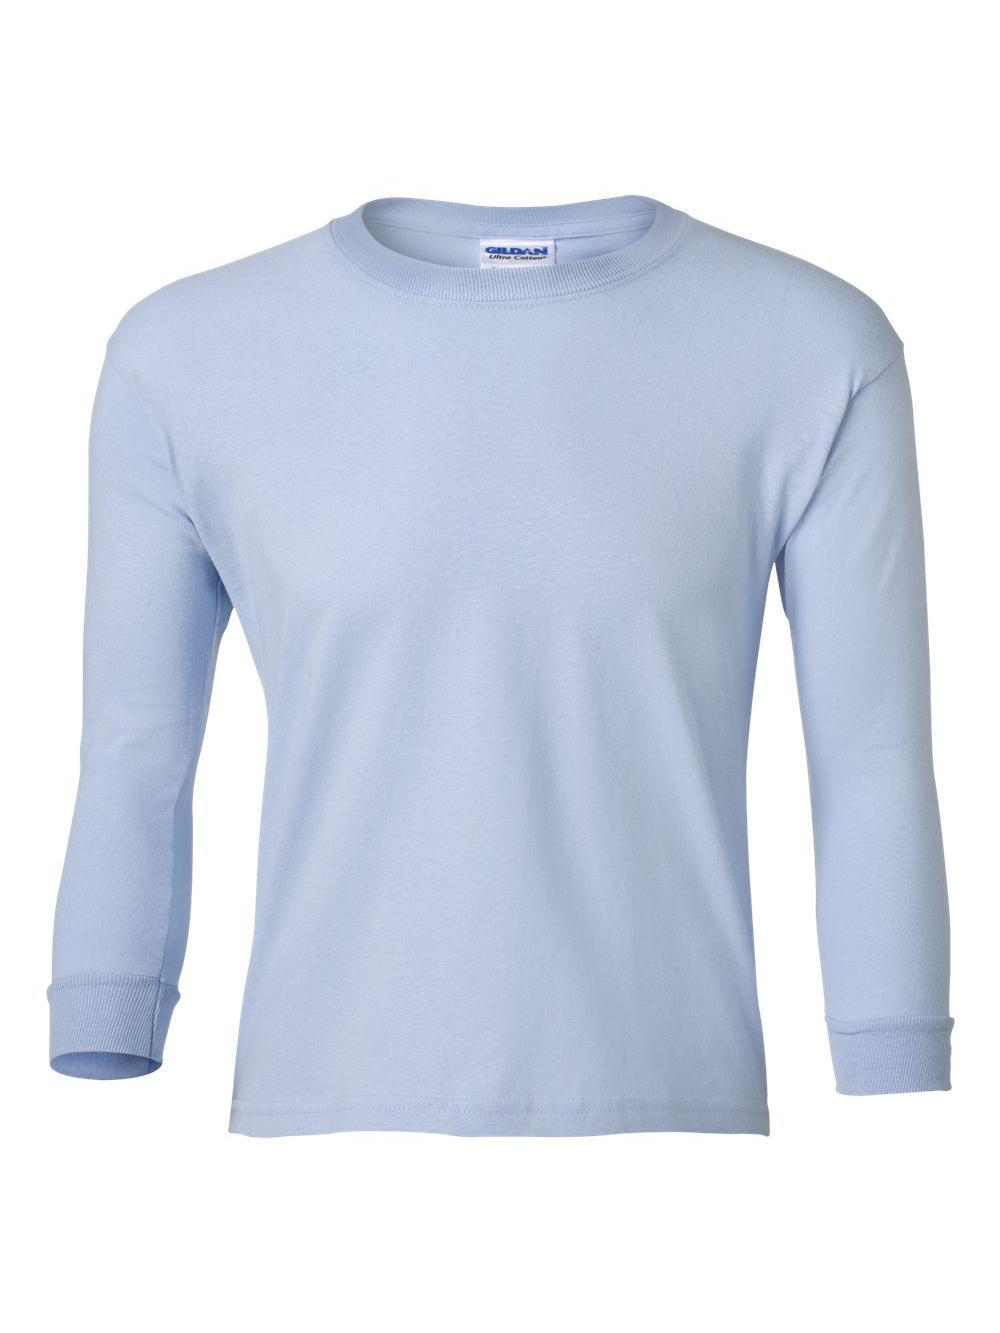 Gildan-Ultra-Cotton-Youth-Long-Sleeve-T-Shirt-2400B thumbnail 15